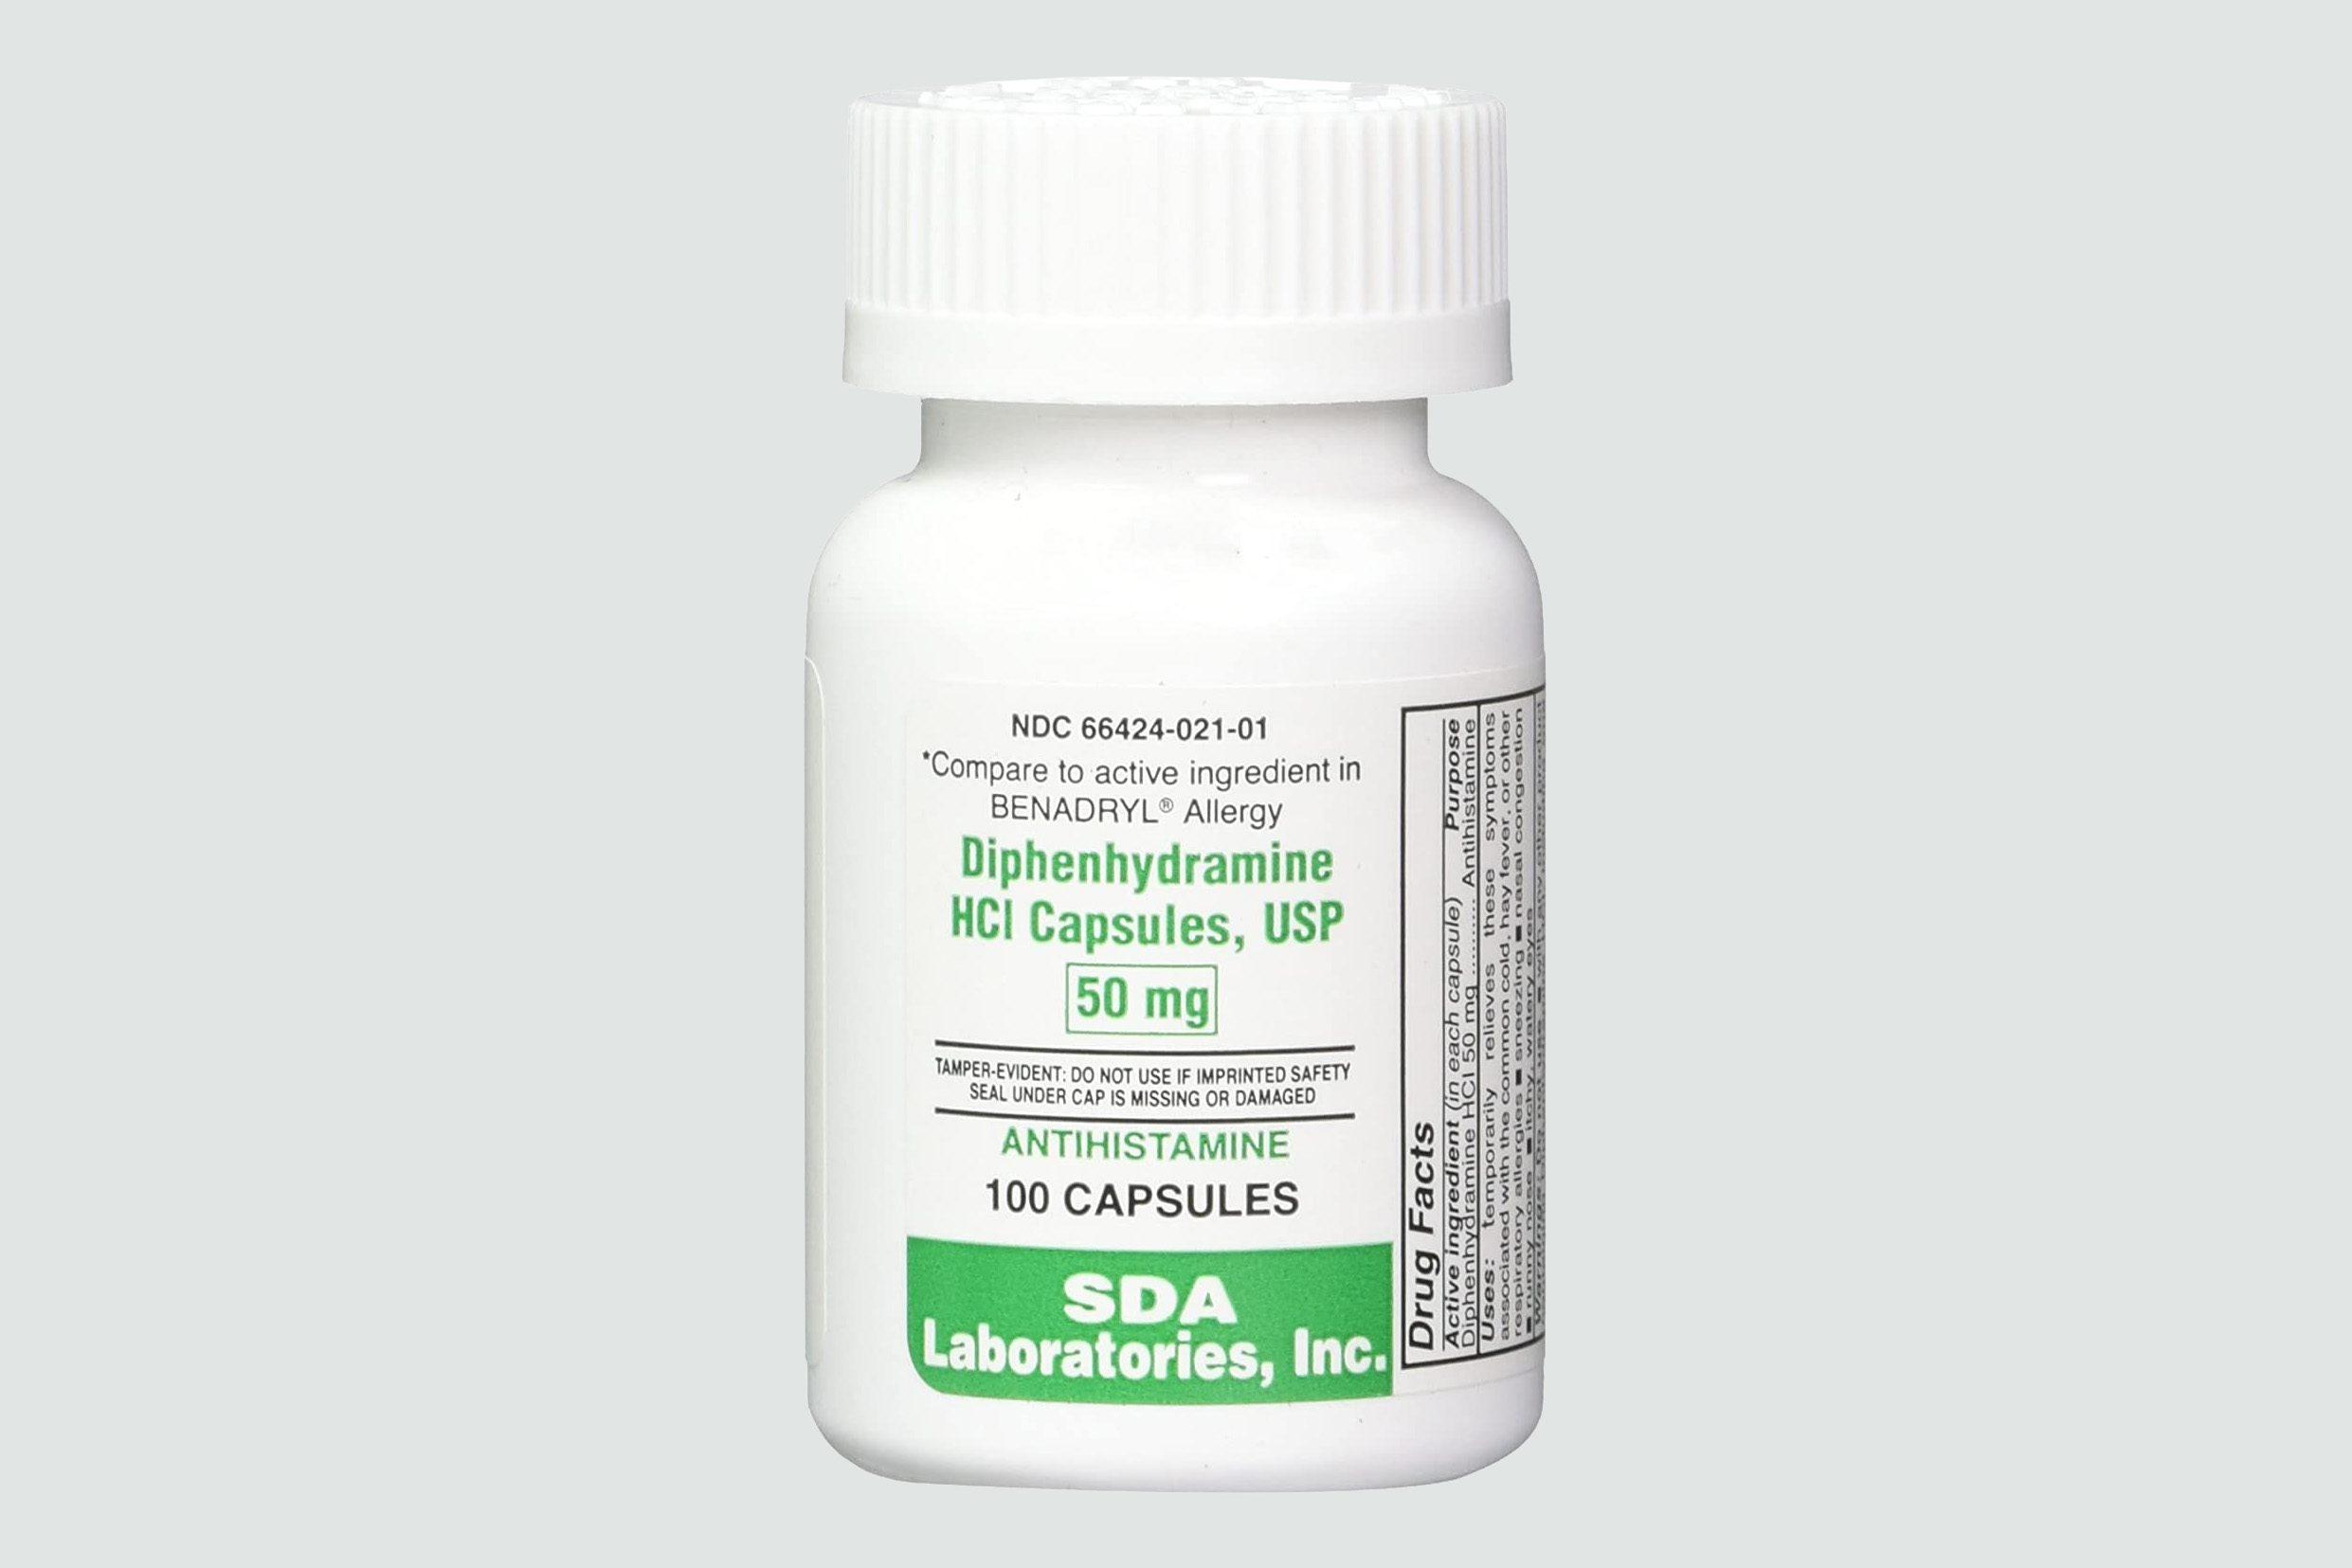 Benadryl (diphenhydramine) pills